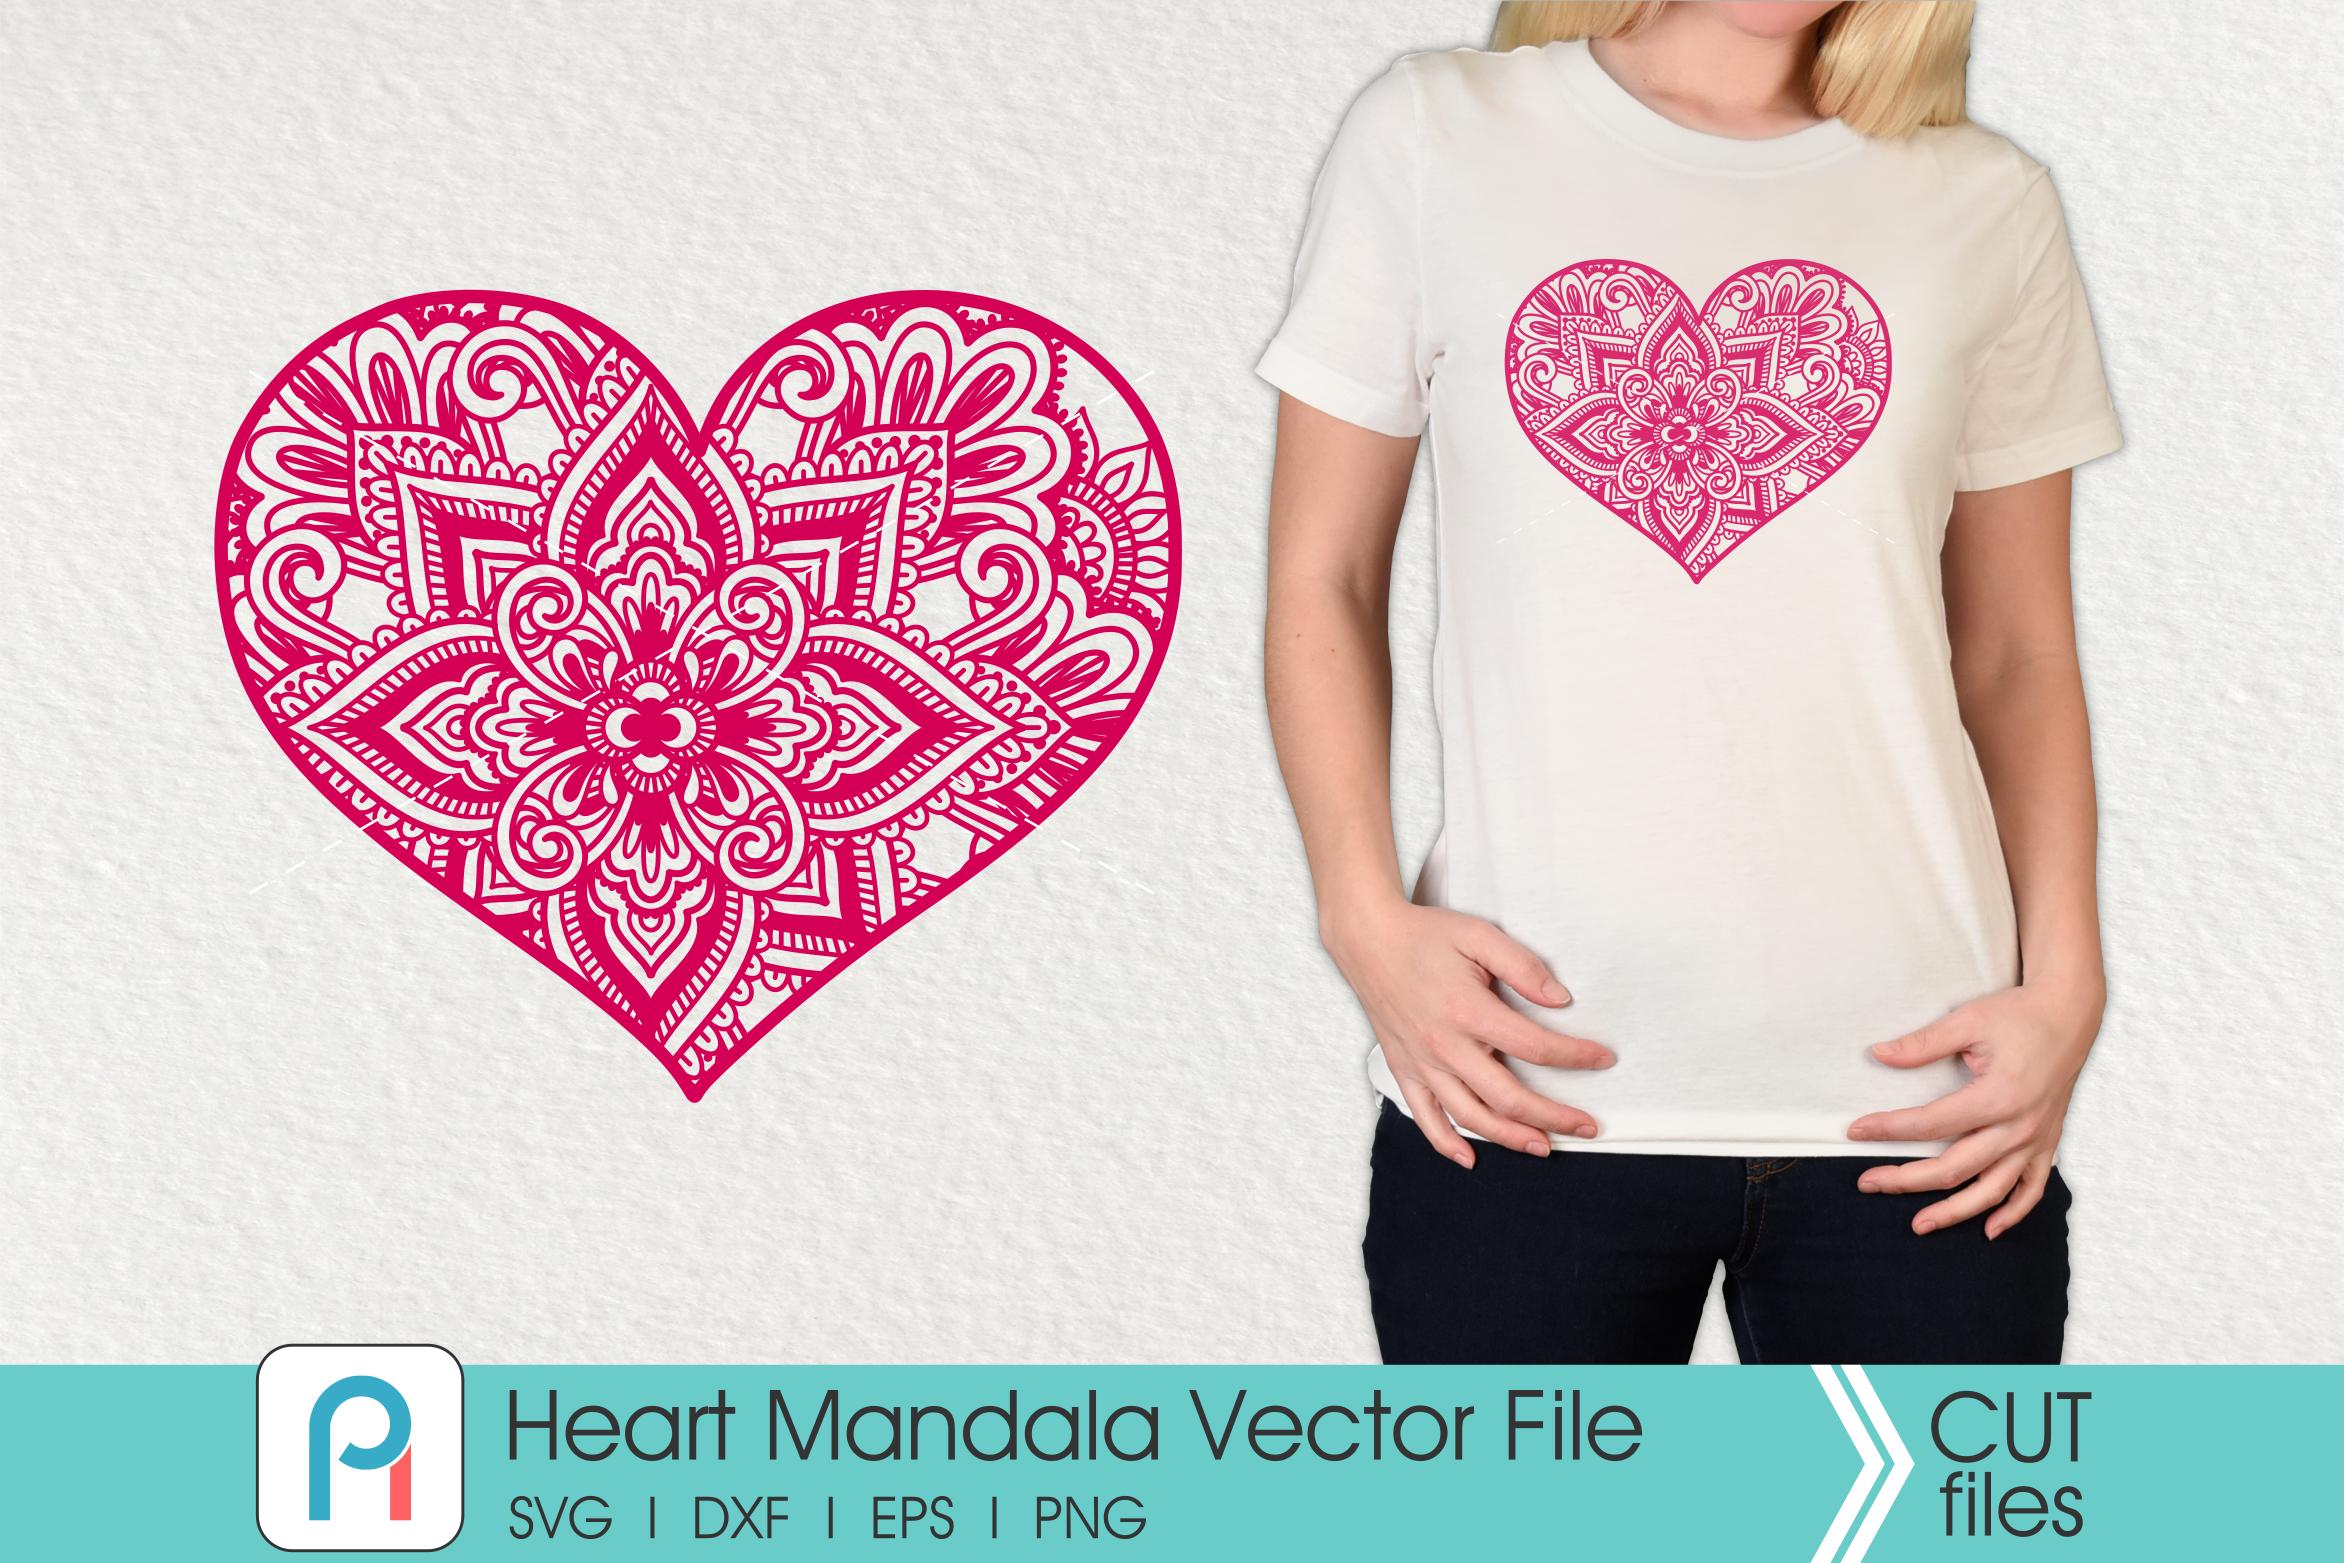 Heart Mandala Svg, Heart Svg, Zentangle Heart Svg, Heart example image 2